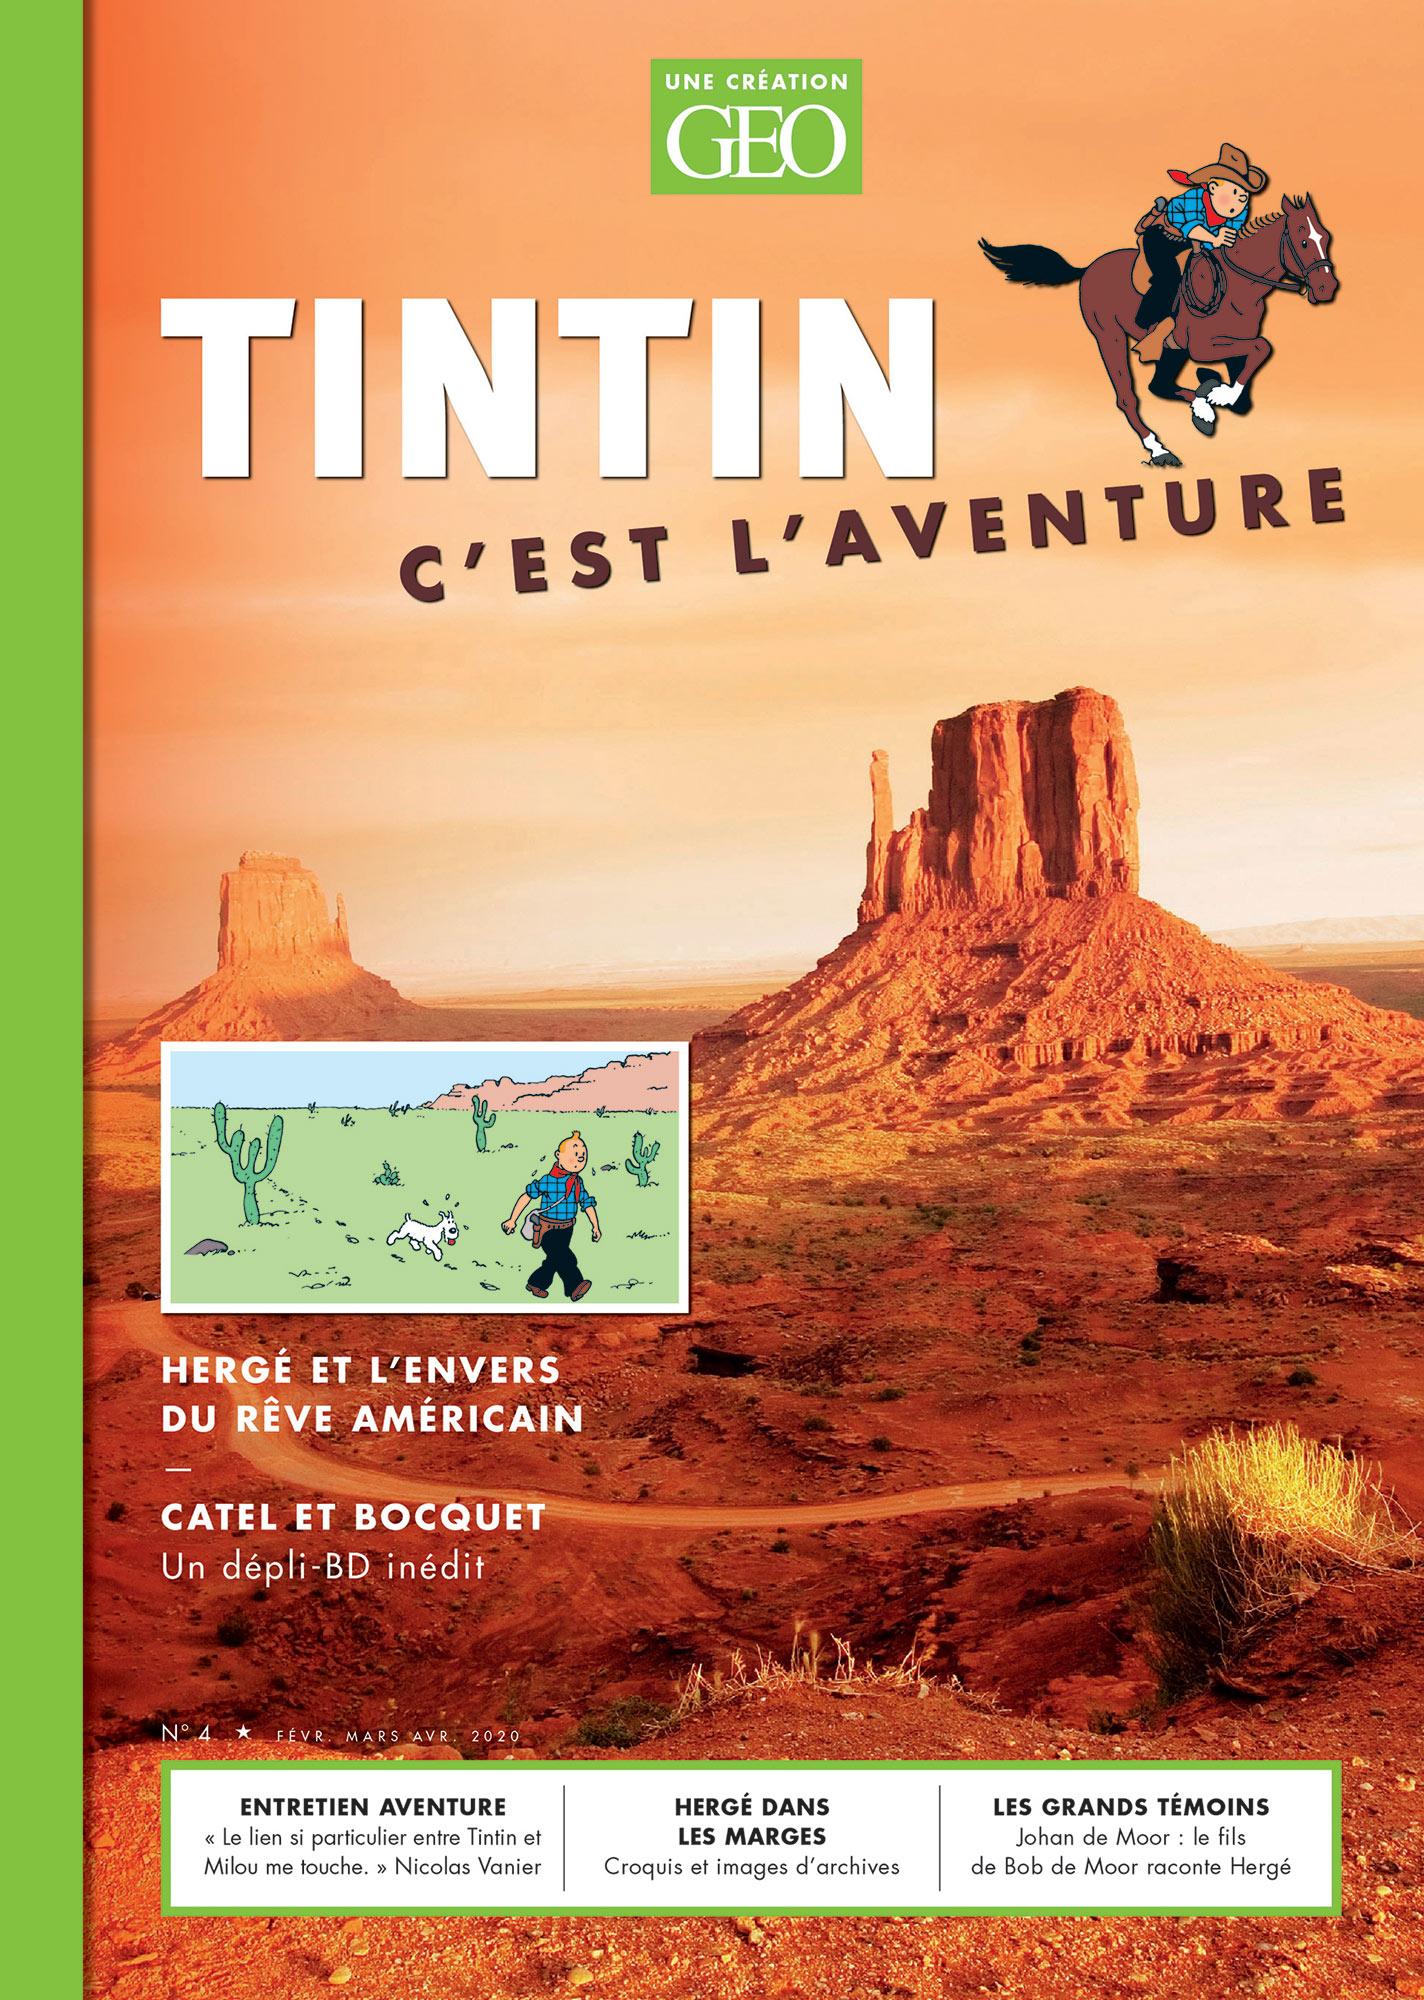 Géo Tintin c'est l'aventure tome 4